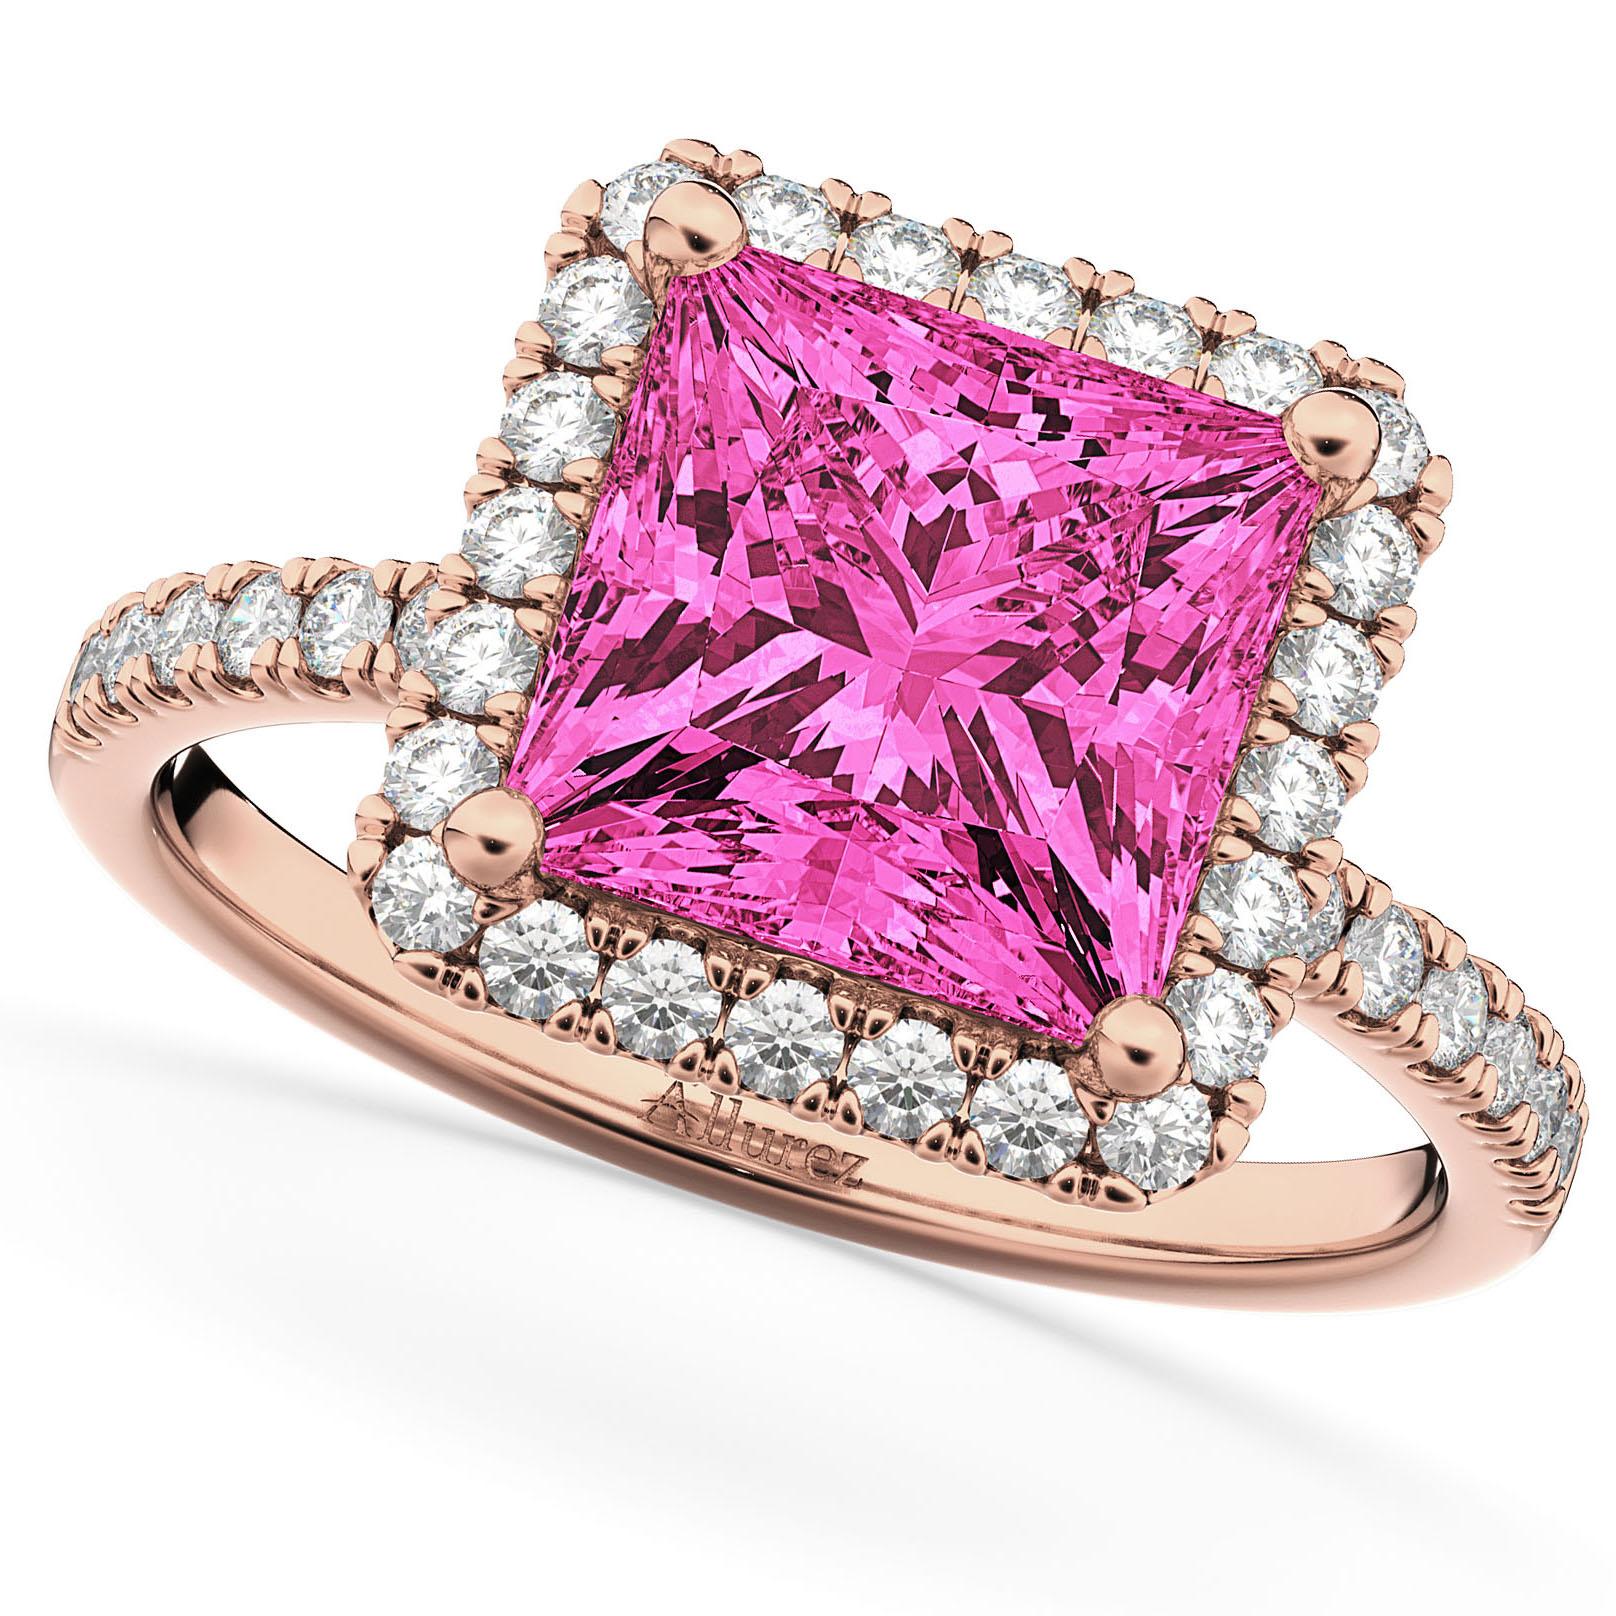 Princess Cut Pink Diamond Wedding Rings Princess Cut Halo Pink Tourmaline Diamond Engagement